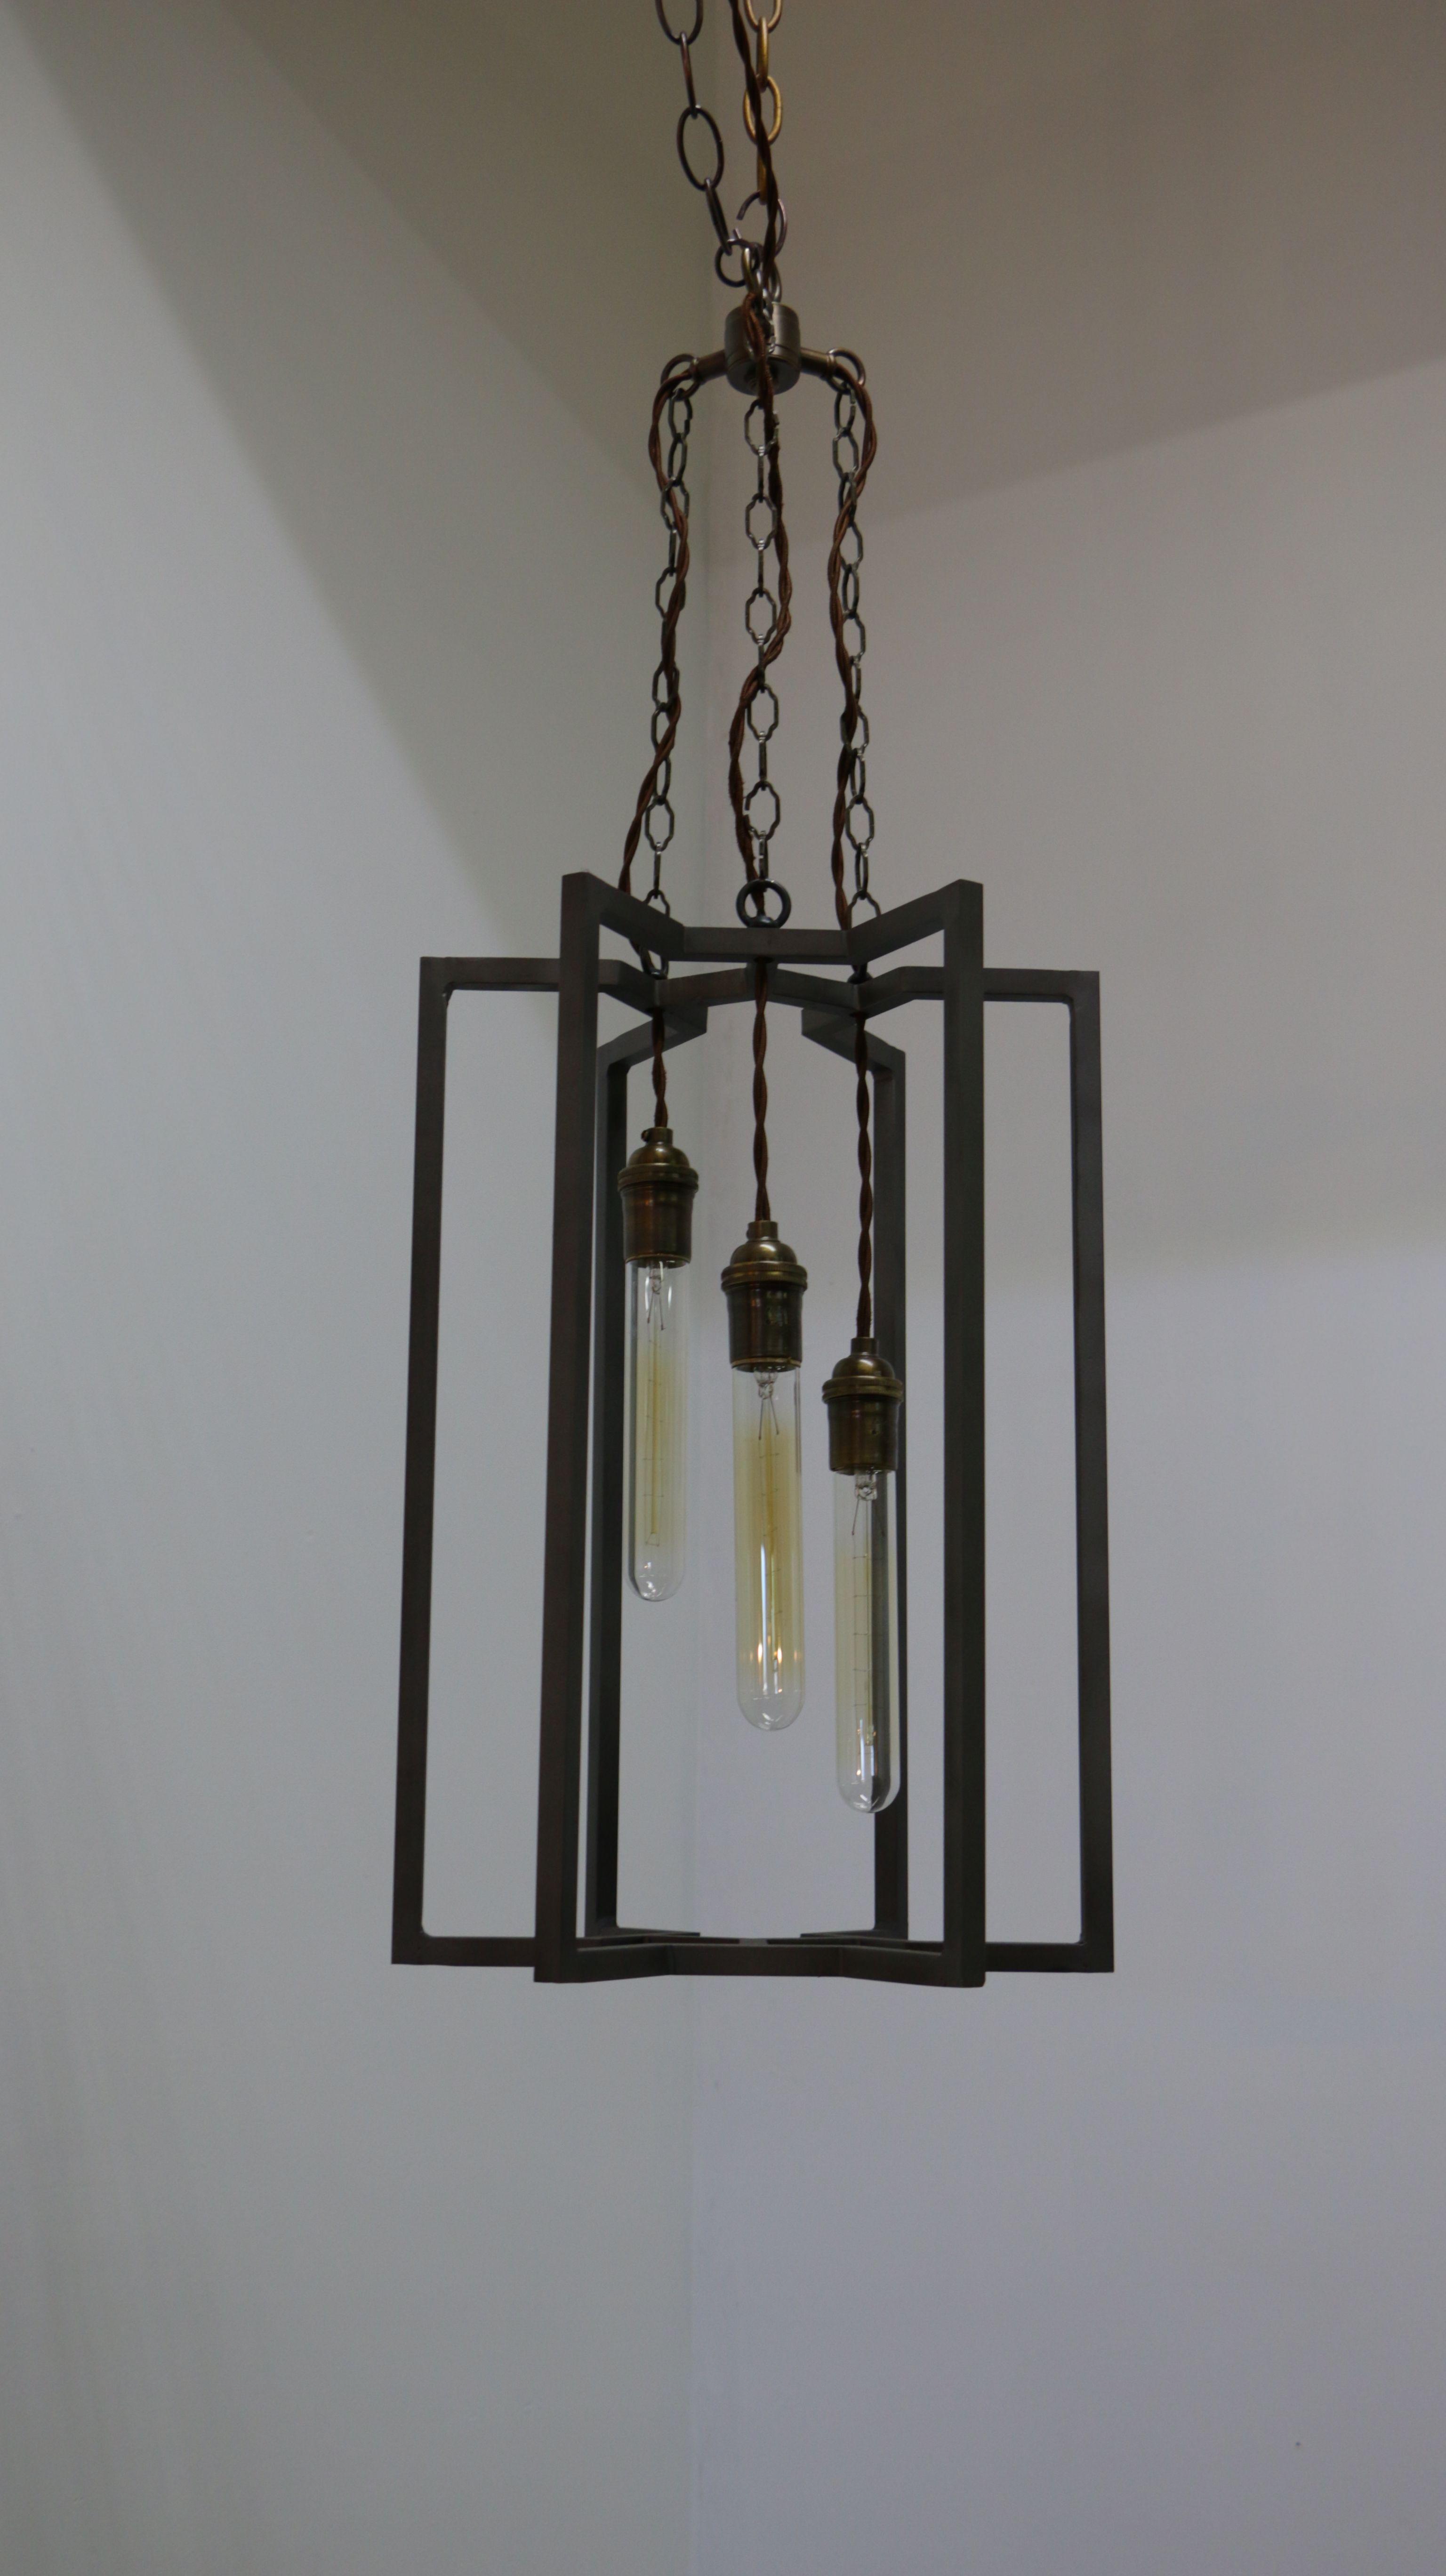 Custom Copper Lighting For Interior Or Exterior. Hand Made In Our Shreveport,  LA Showroom. Copper Works Of Louisiana. #copper #design #lighting #lanterns